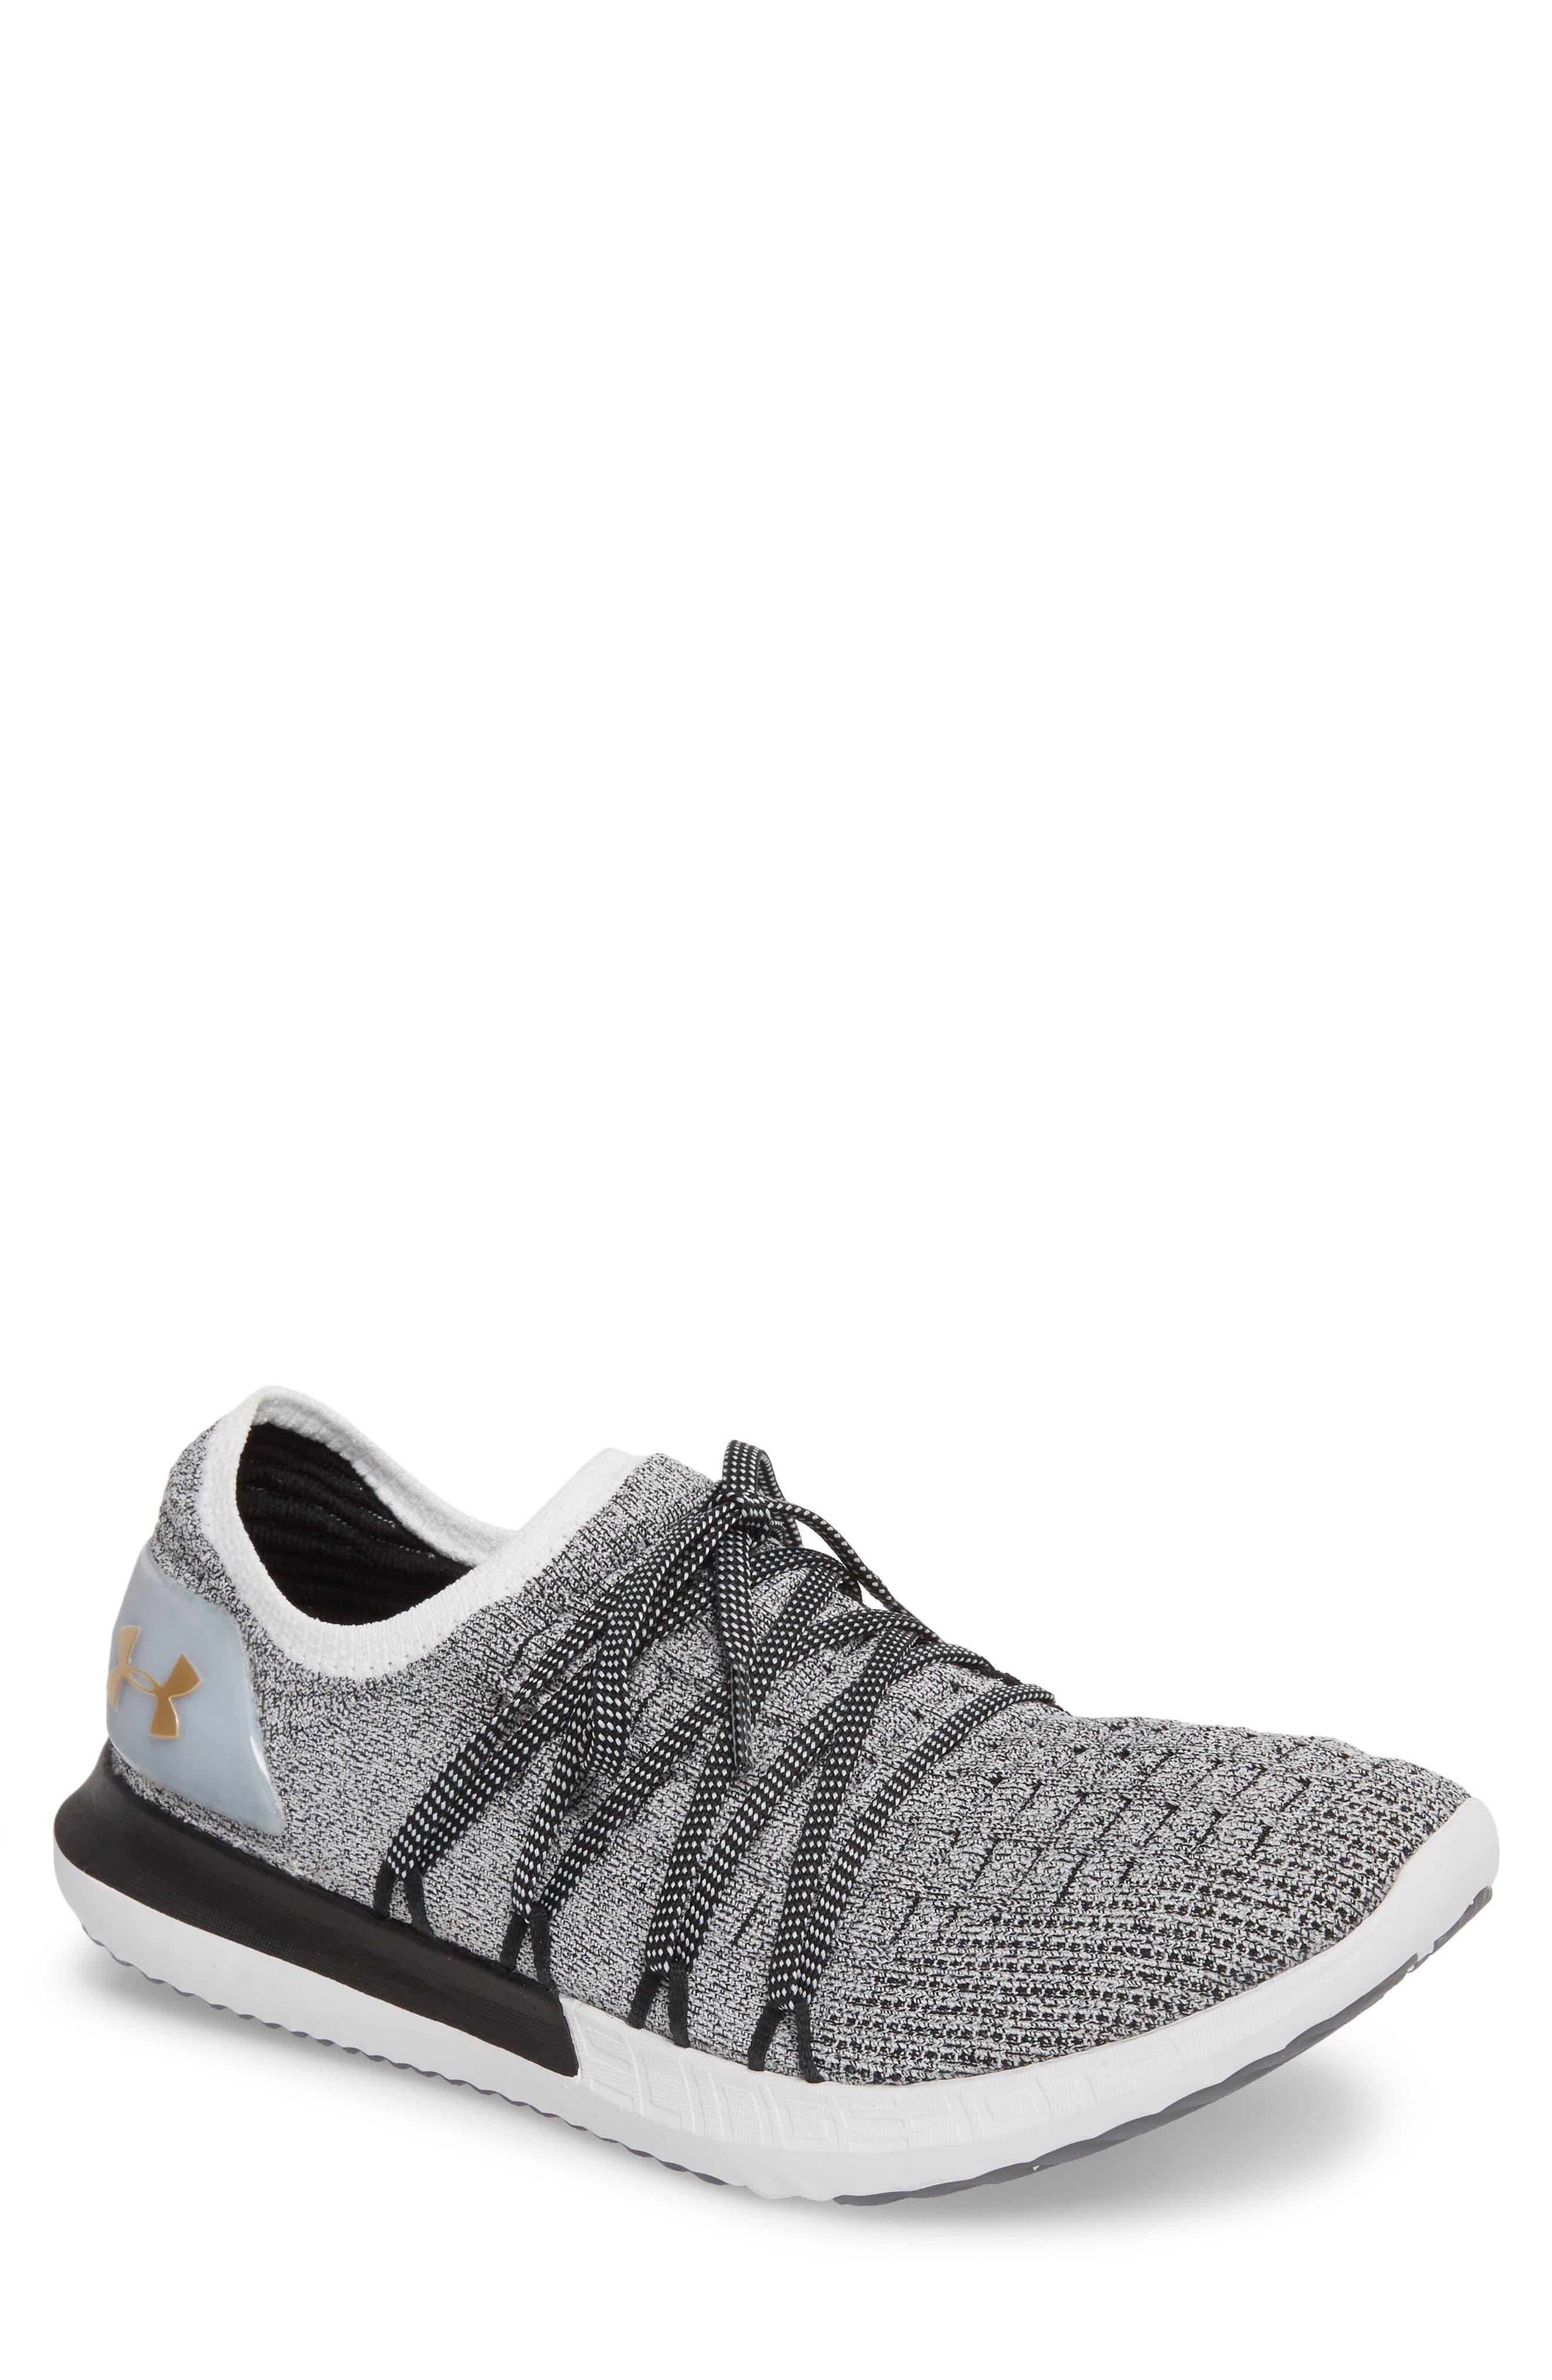 Speedform<sup>®</sup> Slingshot 2 Sneaker,                         Main,                         color, White / Black / Metallic Gold